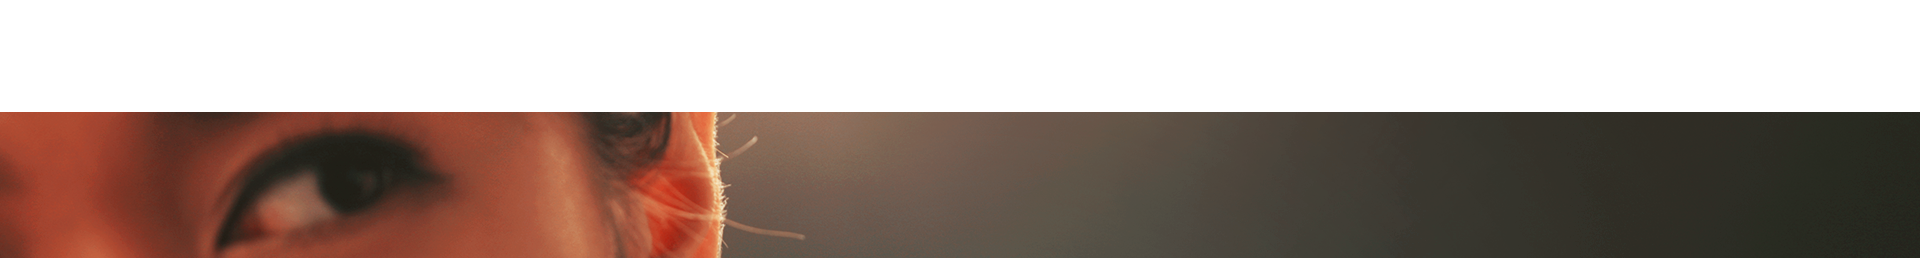 Aromathérapie Anglet, Aromathérapie Bayonne, Aromathérapie Biarritz, Aromathérapie Côte Basque, Aromathérapie Landes, Aupuncture Anglet, Aupuncture Bayonne, Aupuncture Biarritz, Aupuncture Côte Basque, Aupuncture Landes, Énergétique traditionnelle chinoise Anglet, Énergétique traditionnelle chinoise Bayonne, Énergétique traditionnelle chinoise Biarritz, Énergétique traditionnelle chinoise Côte Basque, Énergétique traditionnelle chinoise Landes, Huiles essentielles Anglet, Huiles essentielles Bayonne, Huiles essentielles Biarritz, Huiles essentielles Côte Basque, Huiles essentielles Landes, Ostéopathe Anglet, Ostéopathe Bayonne, Ostéopathe Biarritz, Ostéopathe Côte Basque, Ostéopathe Landes